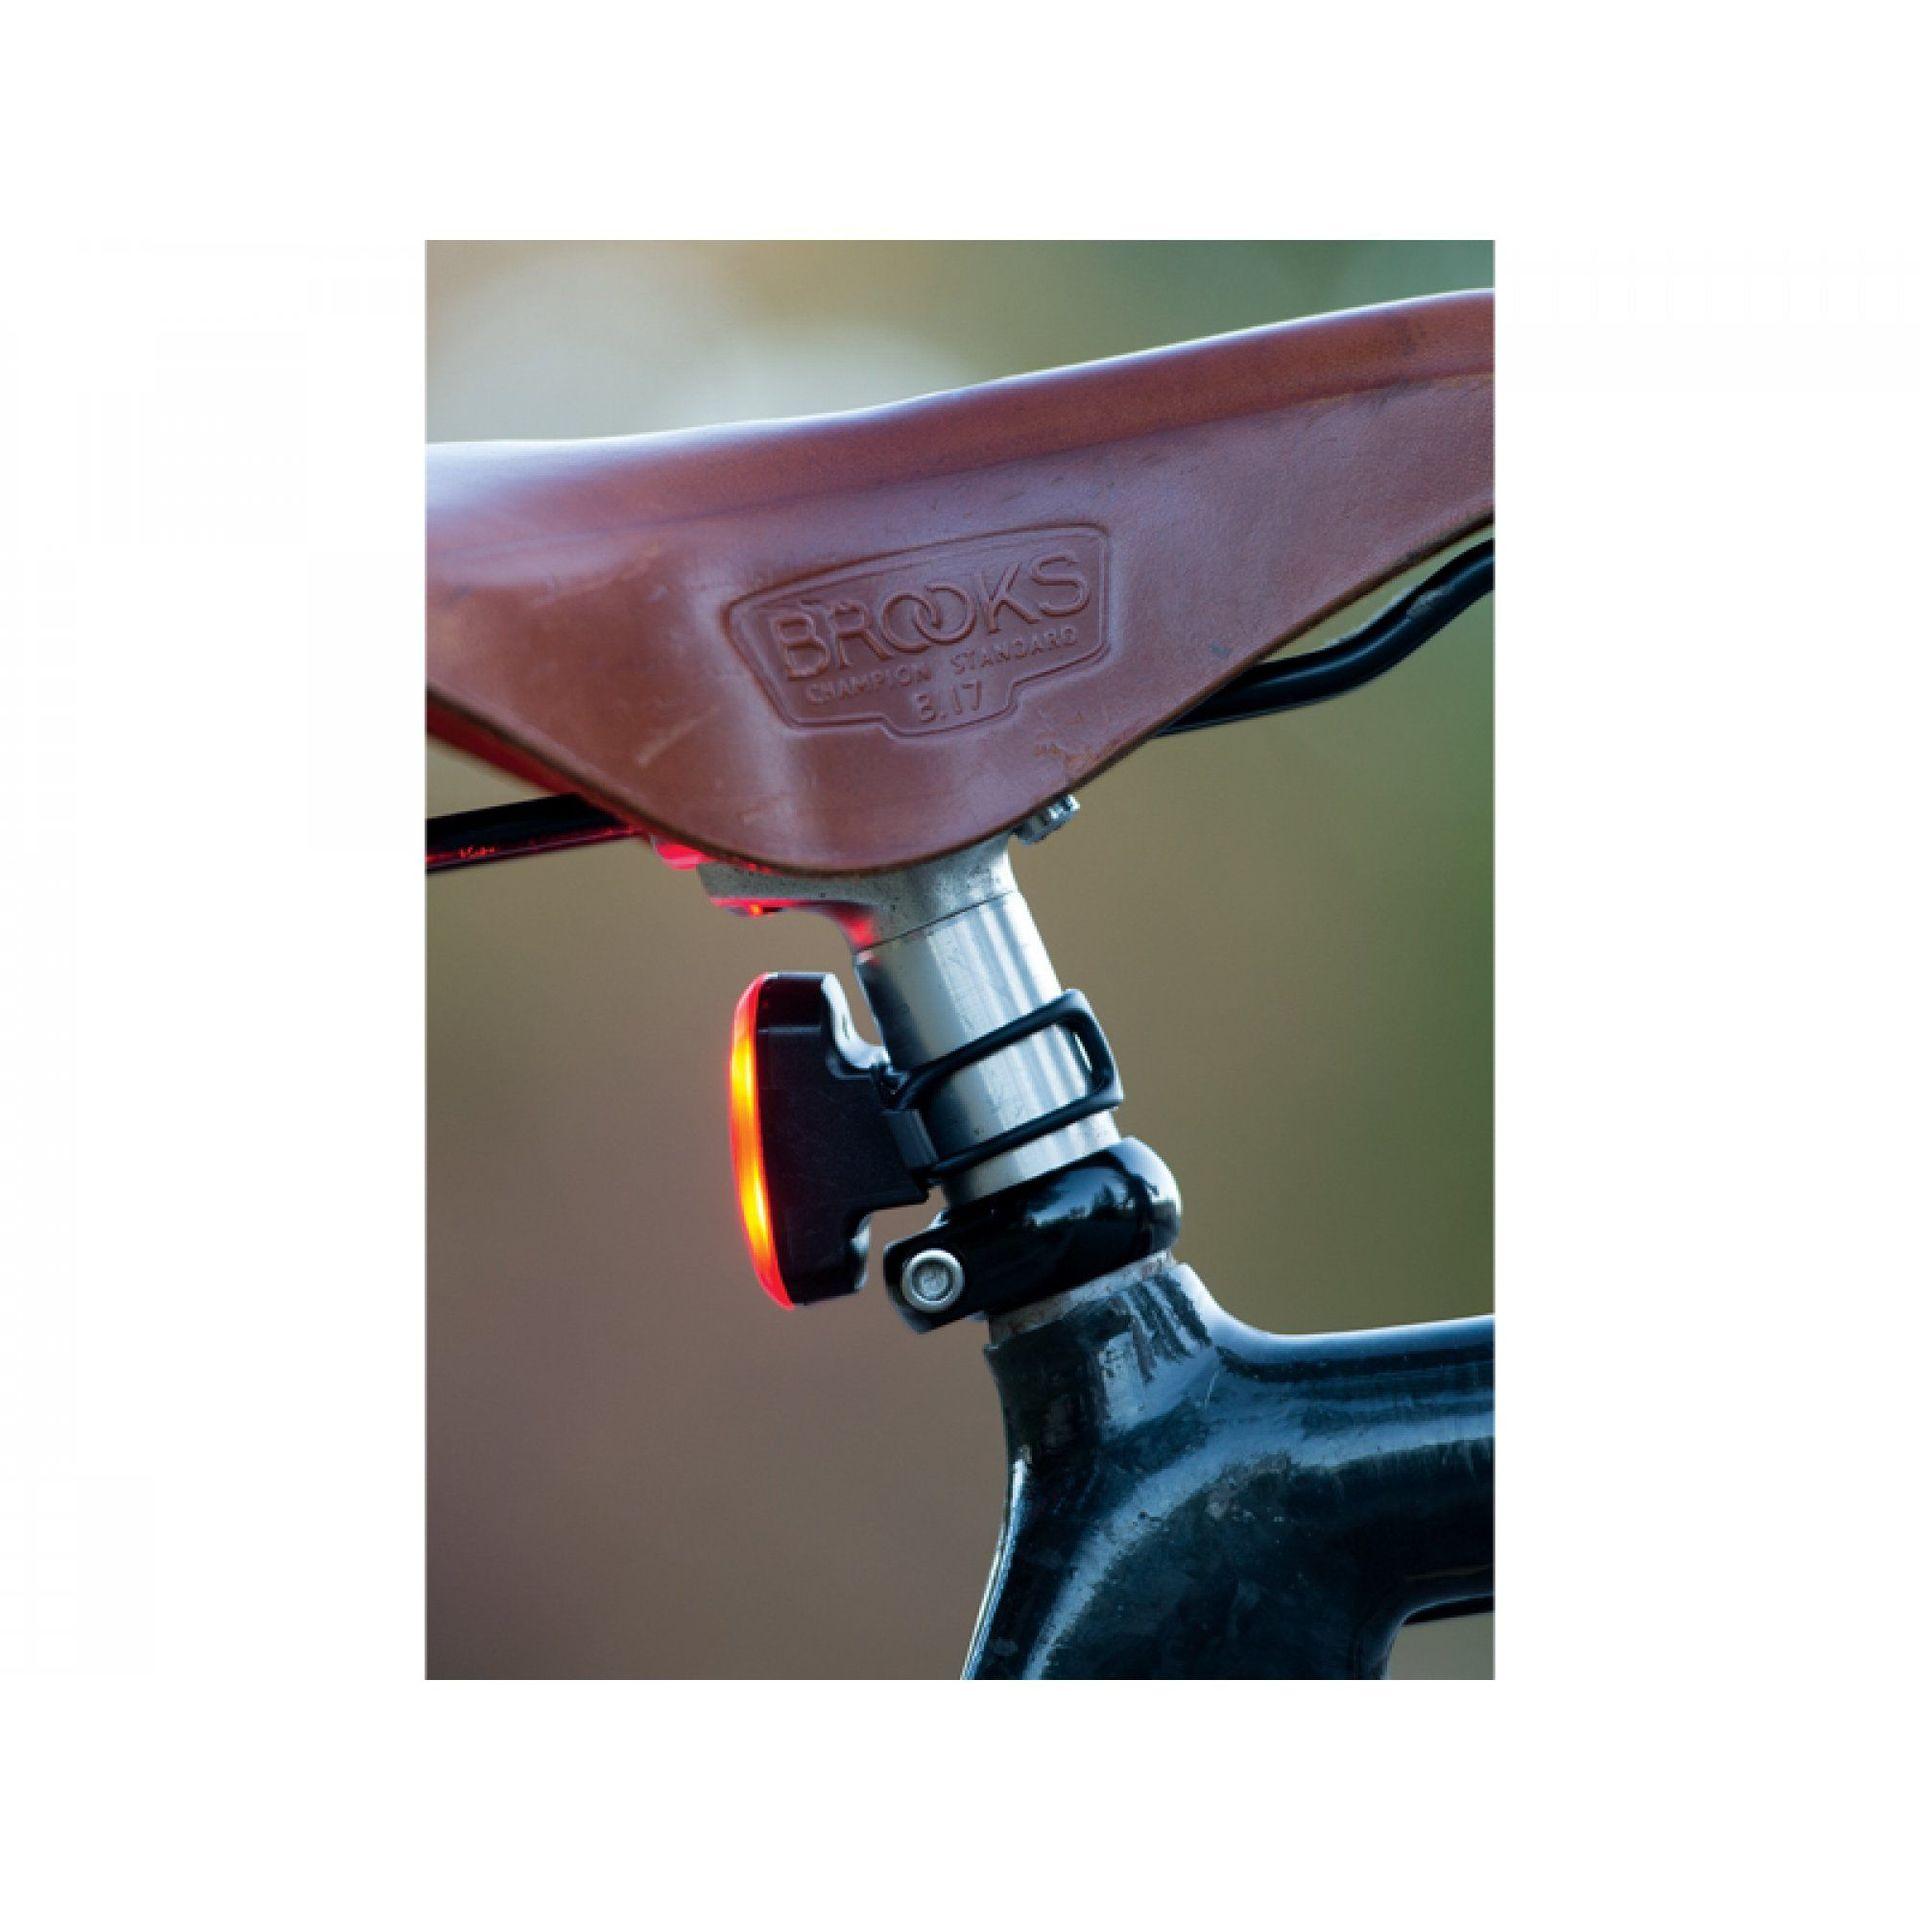 LAMPKA ROWEROWA TYLNA BLACKBURN CLICK USB CZARNY 2